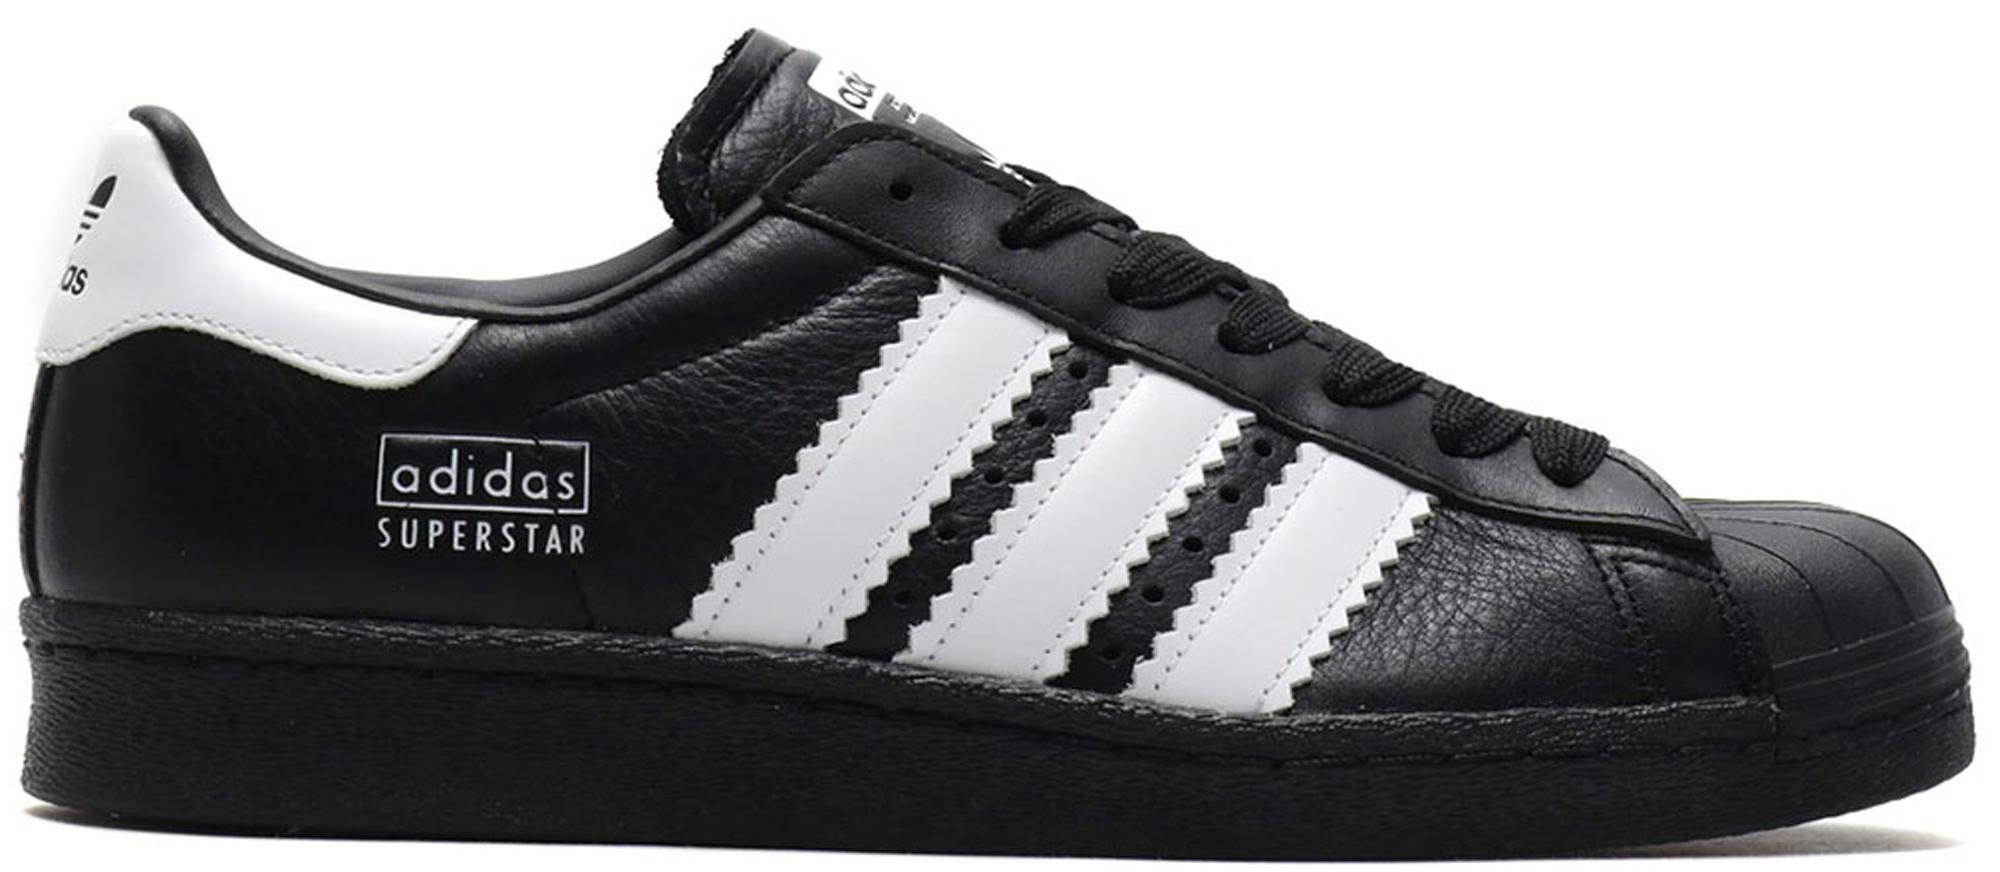 adidas Superstar 80s Enlarged Stripes